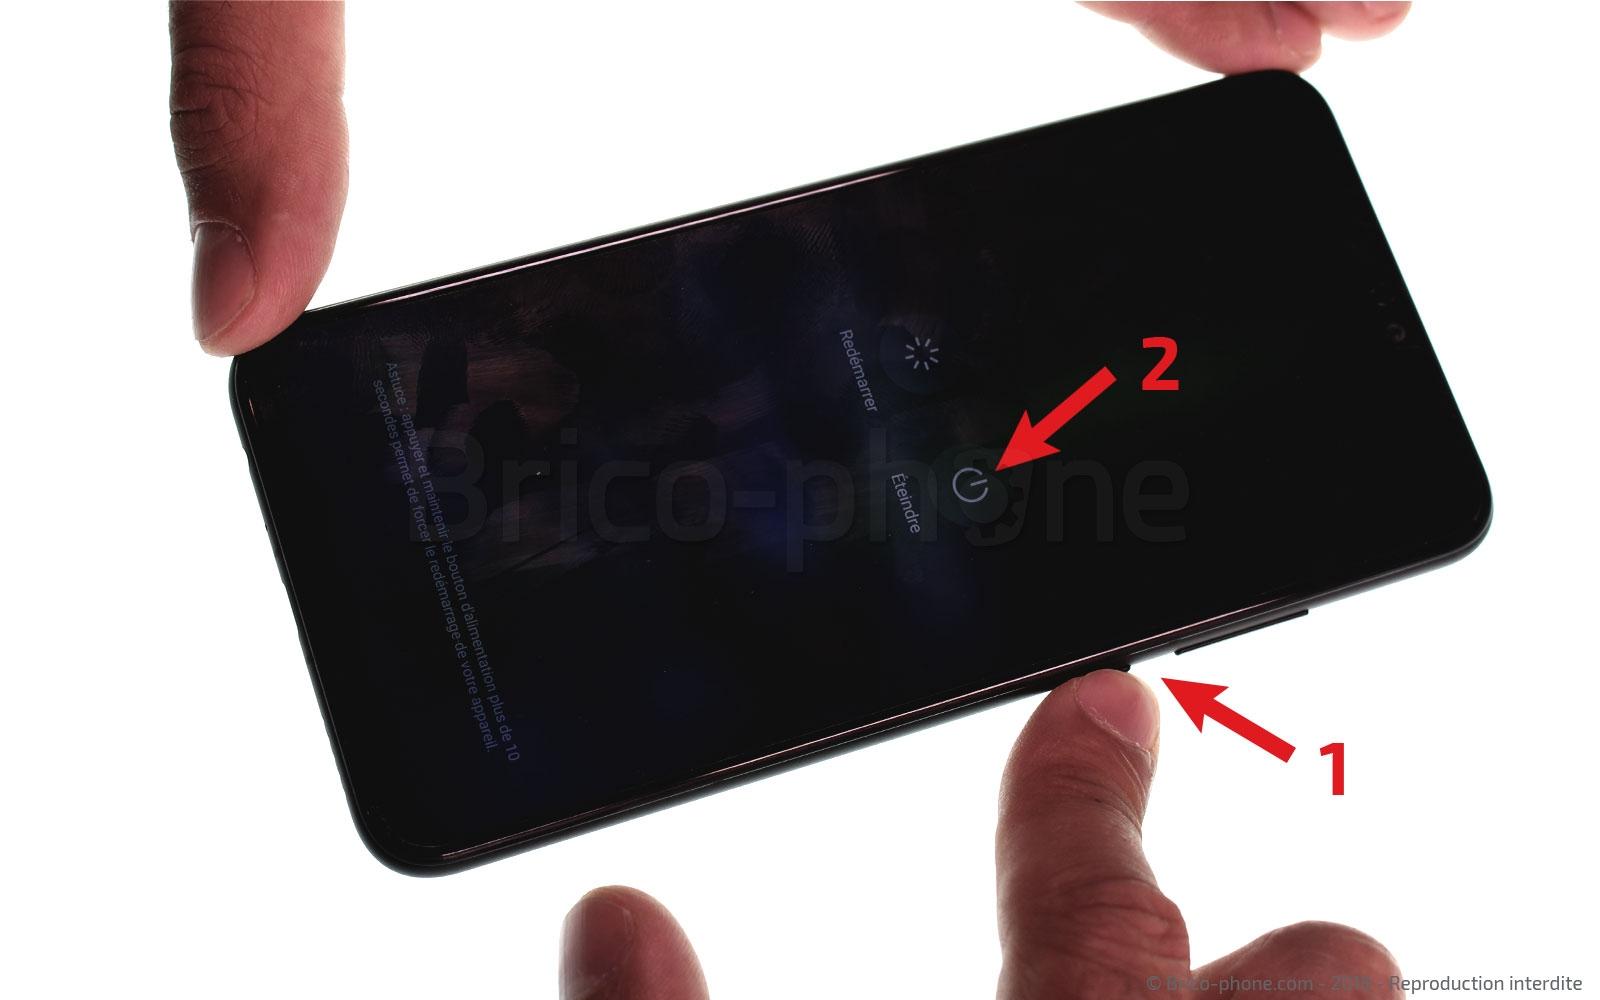 Etape 1 : Eteindre le smartphone